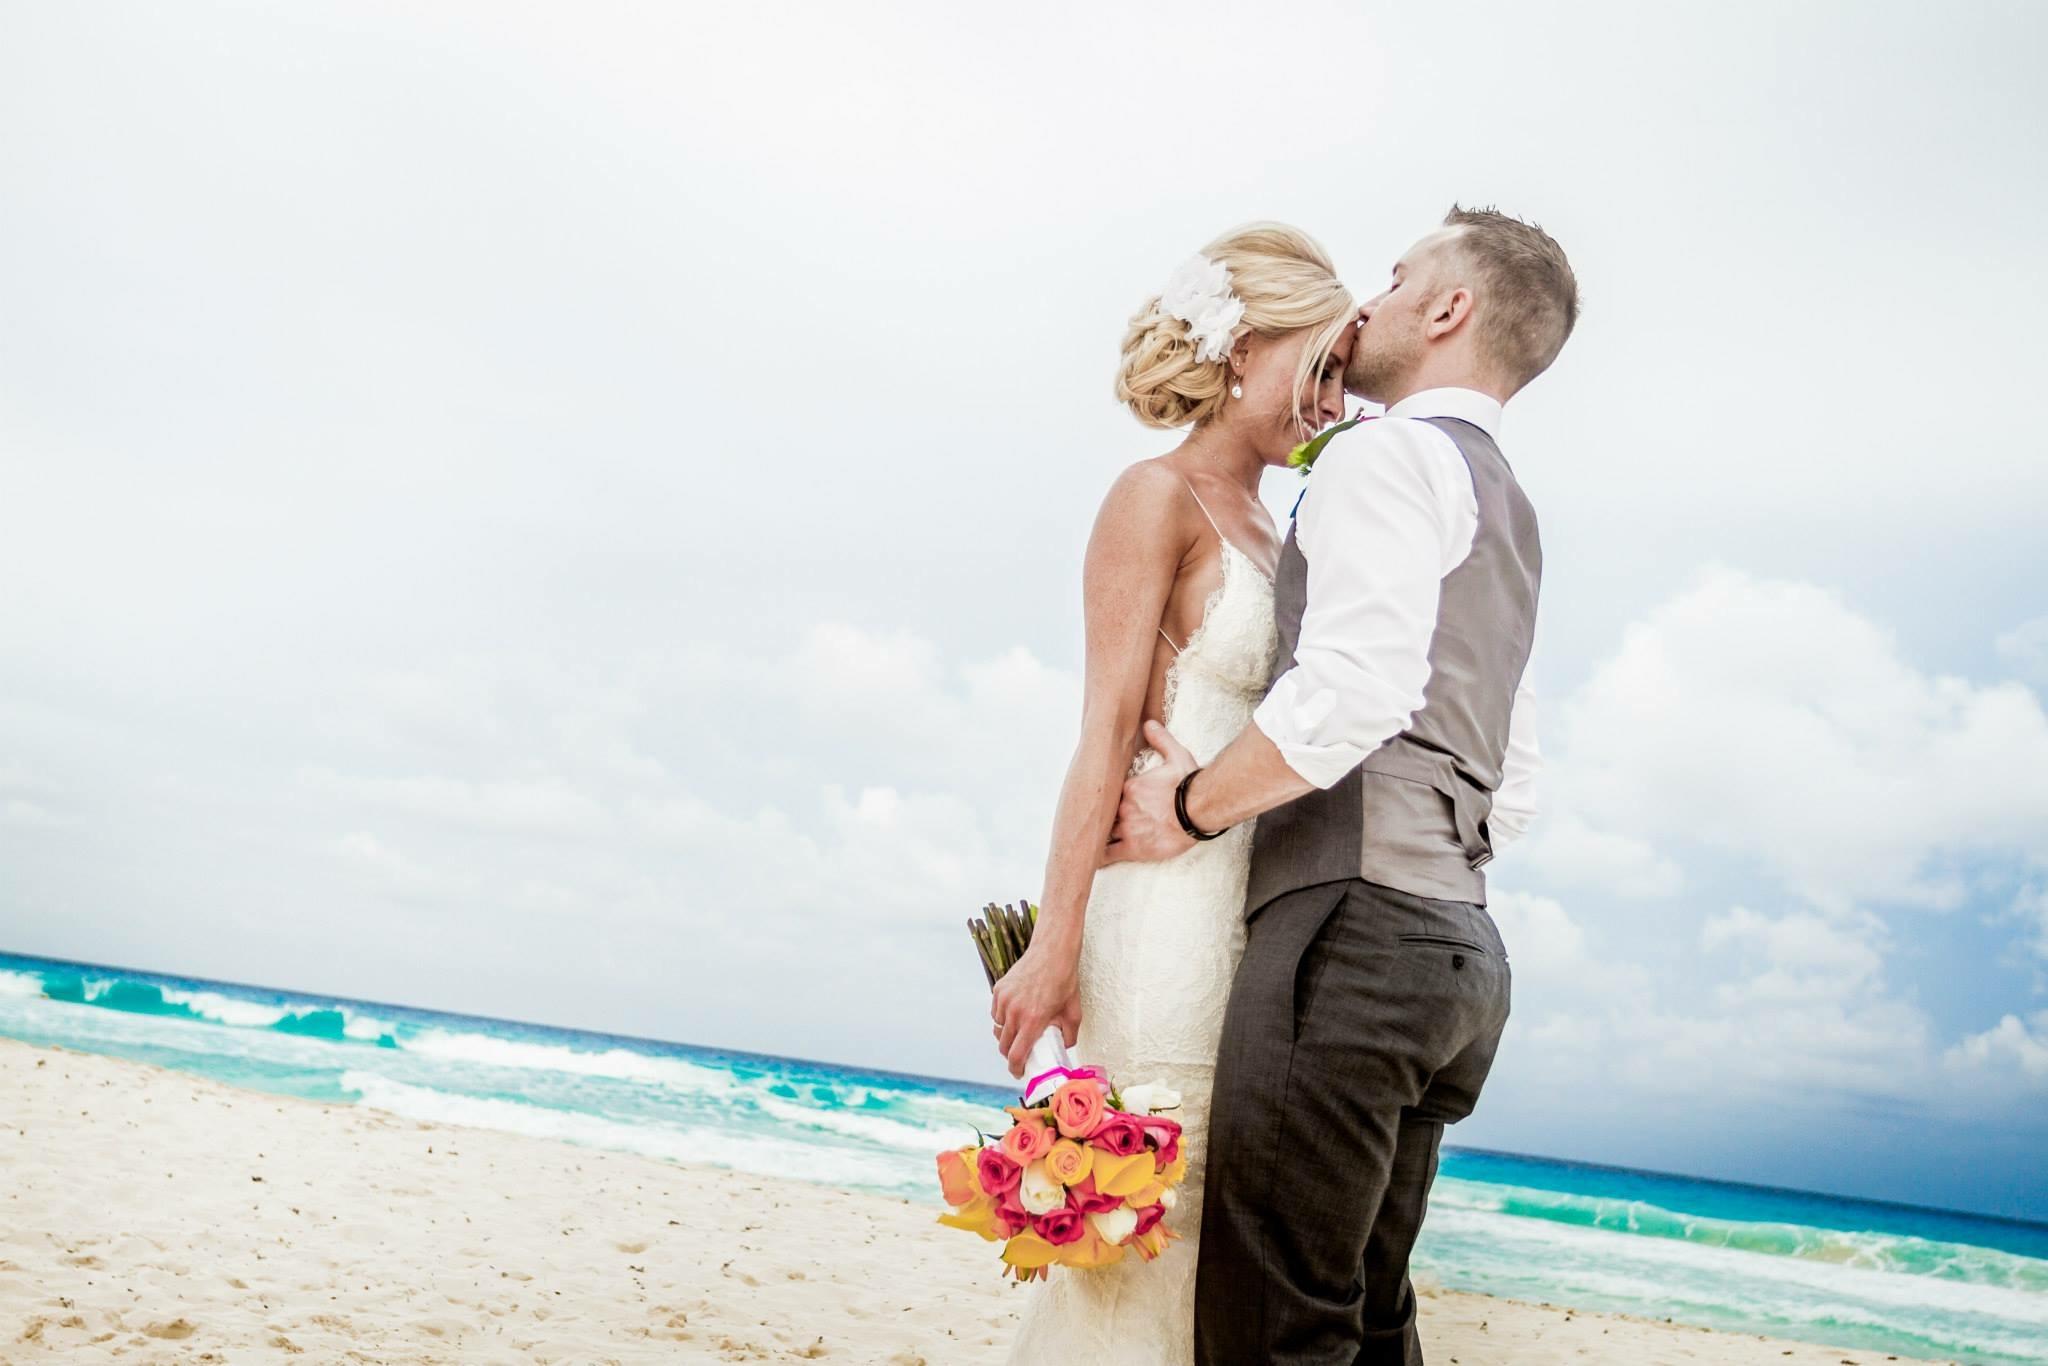 krysten-reed-cancun-beach-wedding-18.JPG